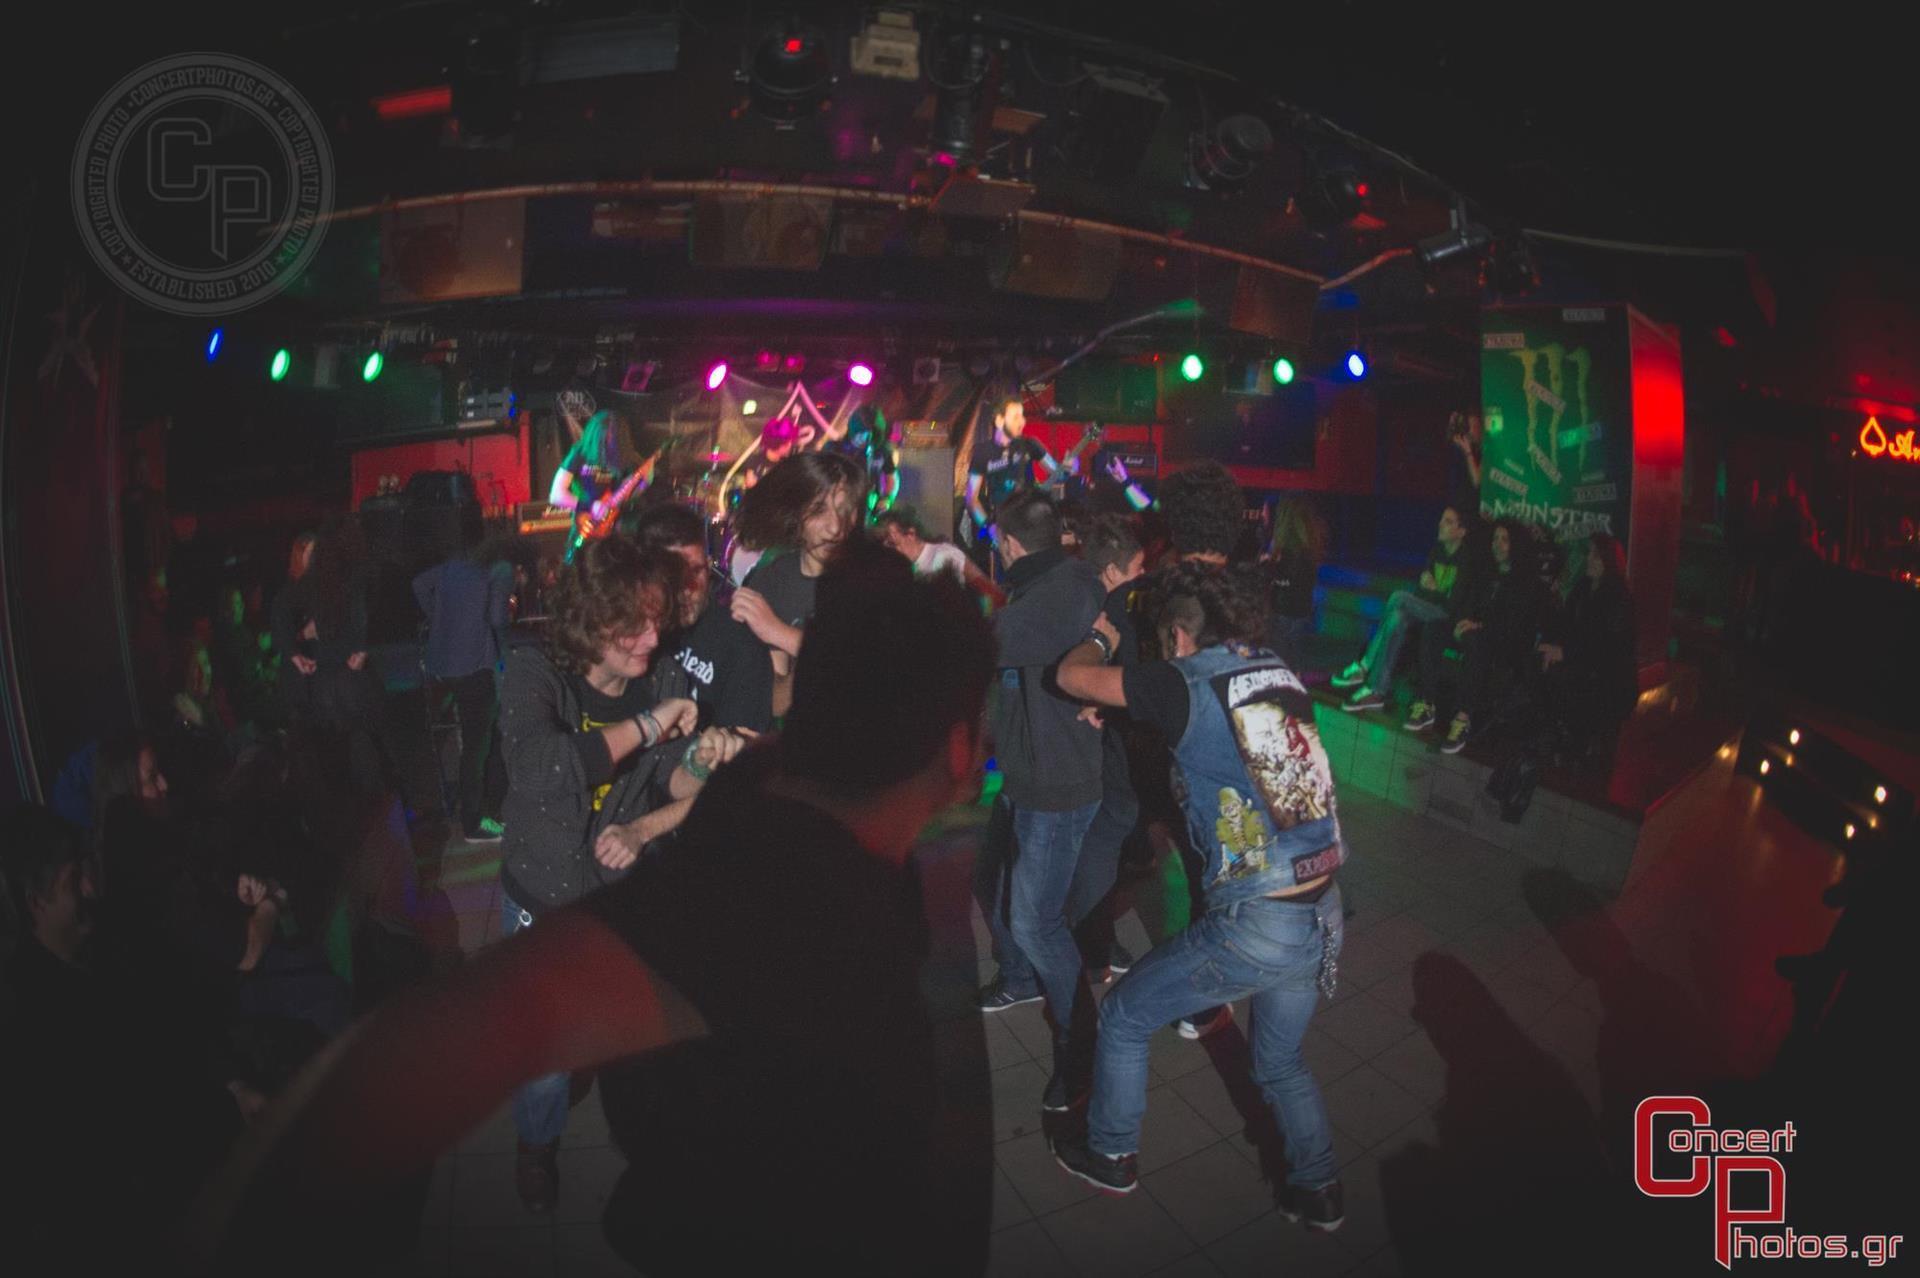 Battle Of The Bands Athens - Leg 3- photographer:  - ConcertPhotos - 20150104_2325_17